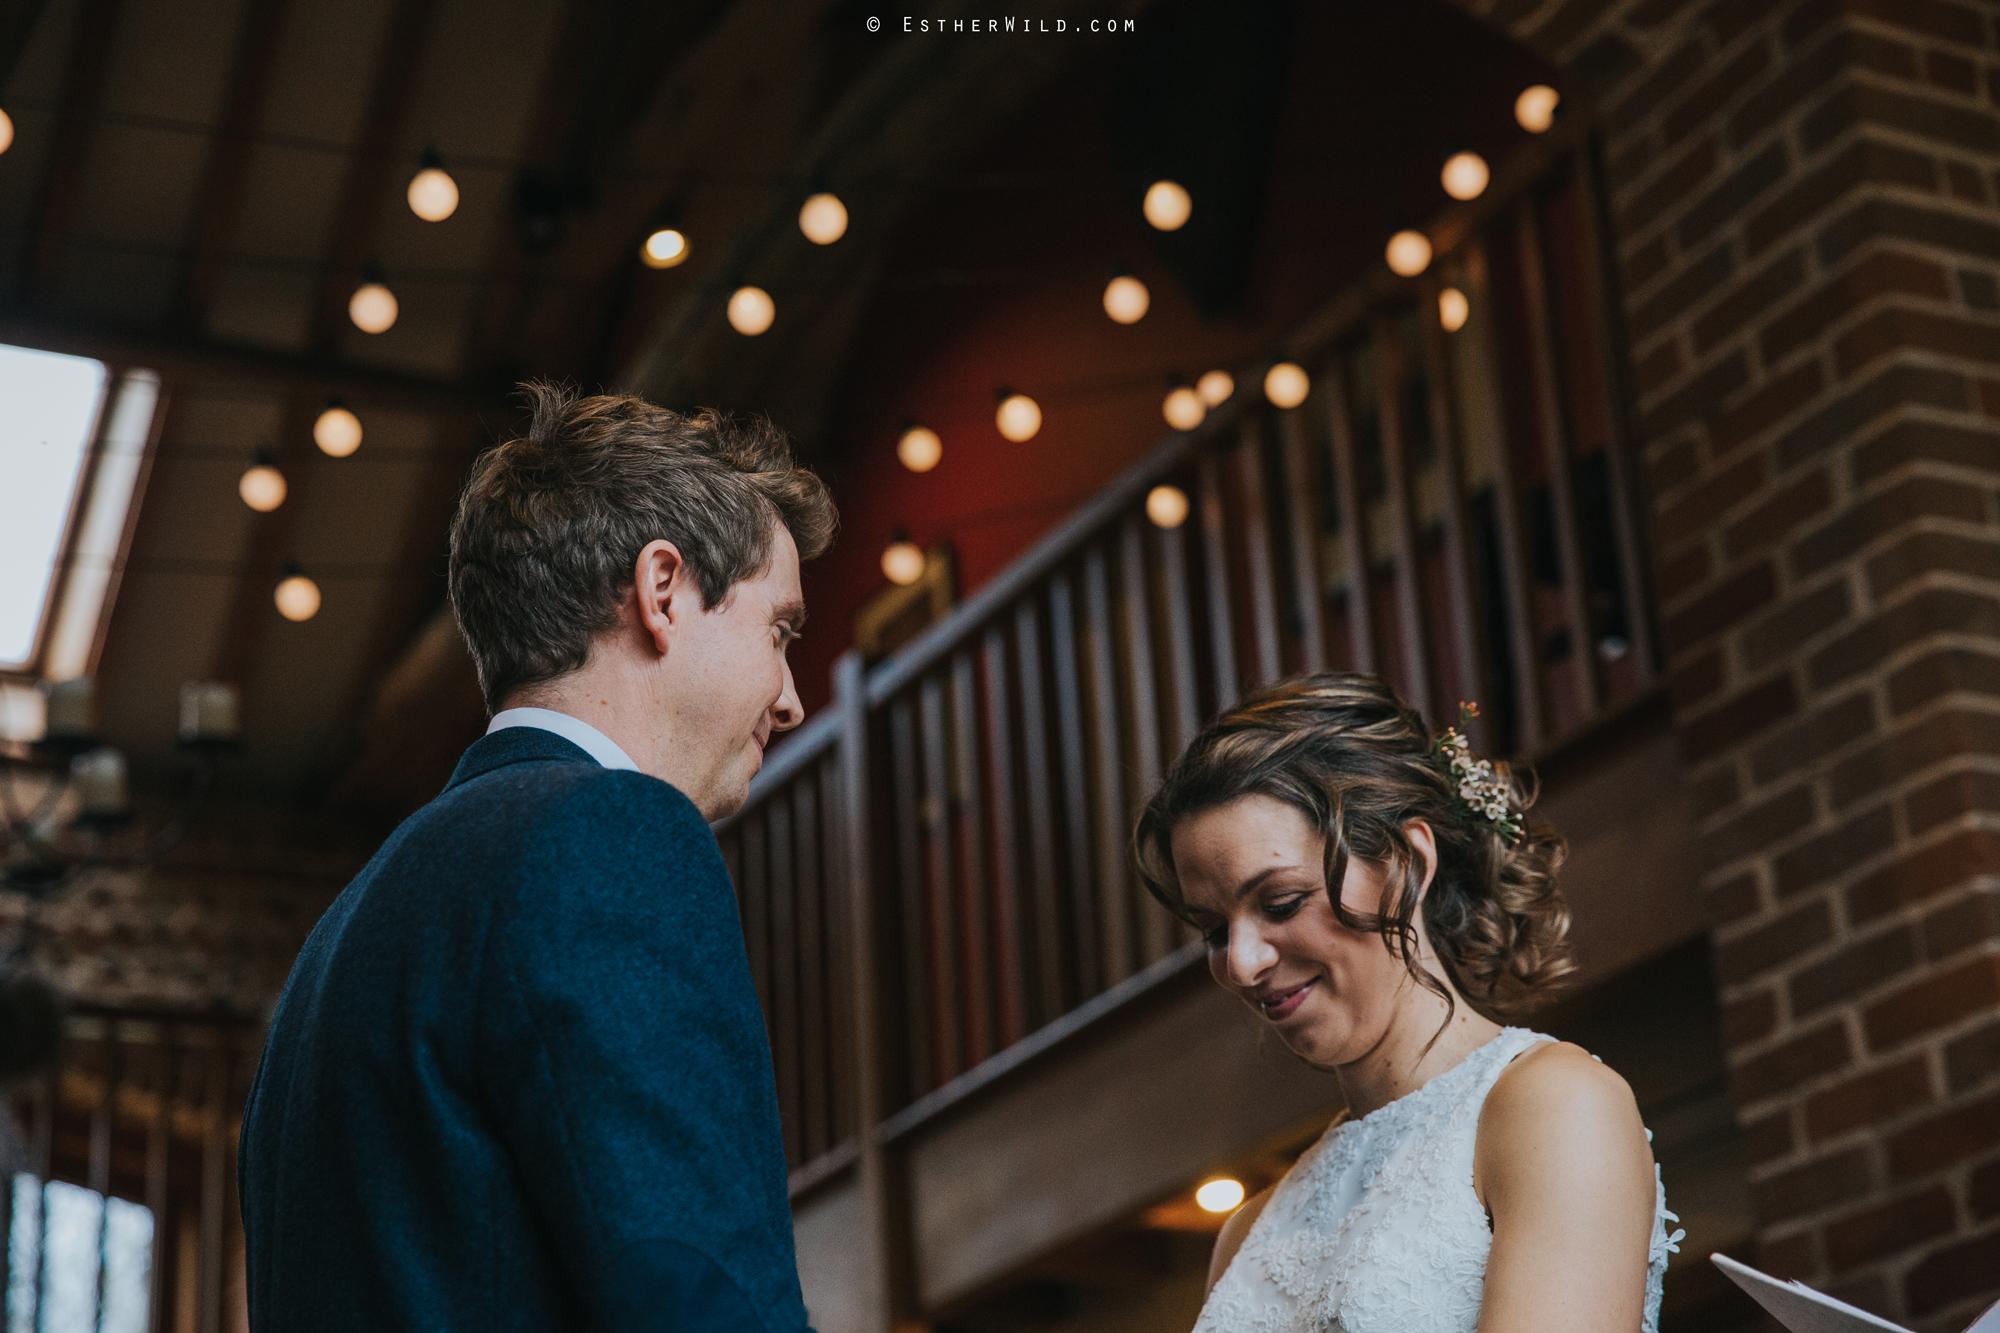 1117_Chaucer_Barn_Wedding_Photography_Esther_Wild_Norfolk_Photographer_IMG_0683.jpg